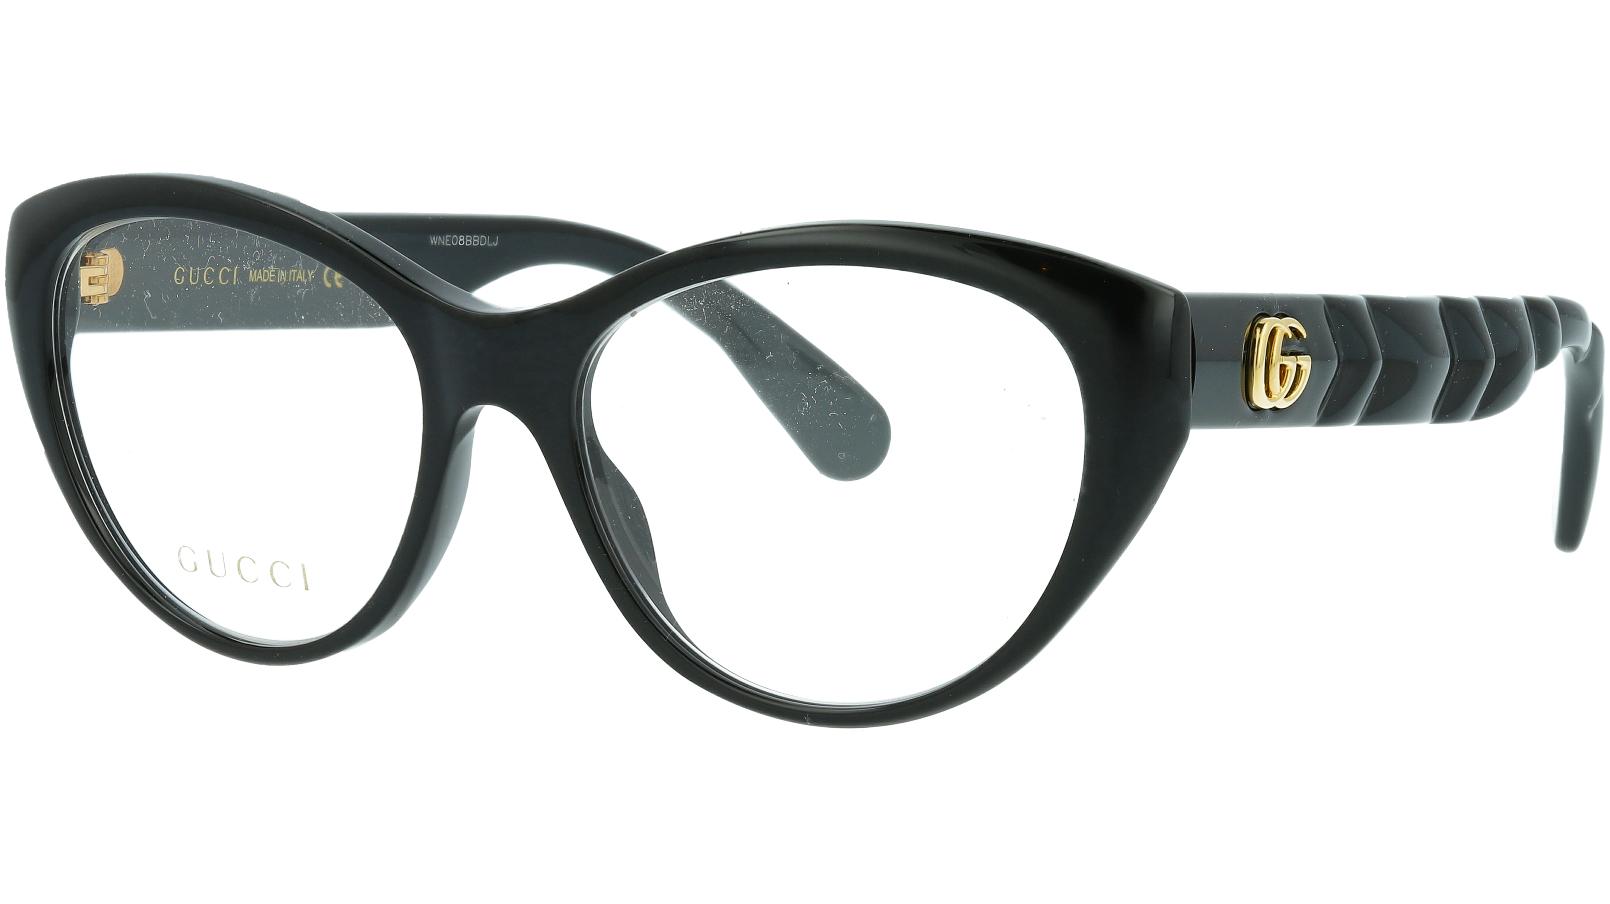 Gucci GG0812O 001 54 Black Cat-Eye Glasses